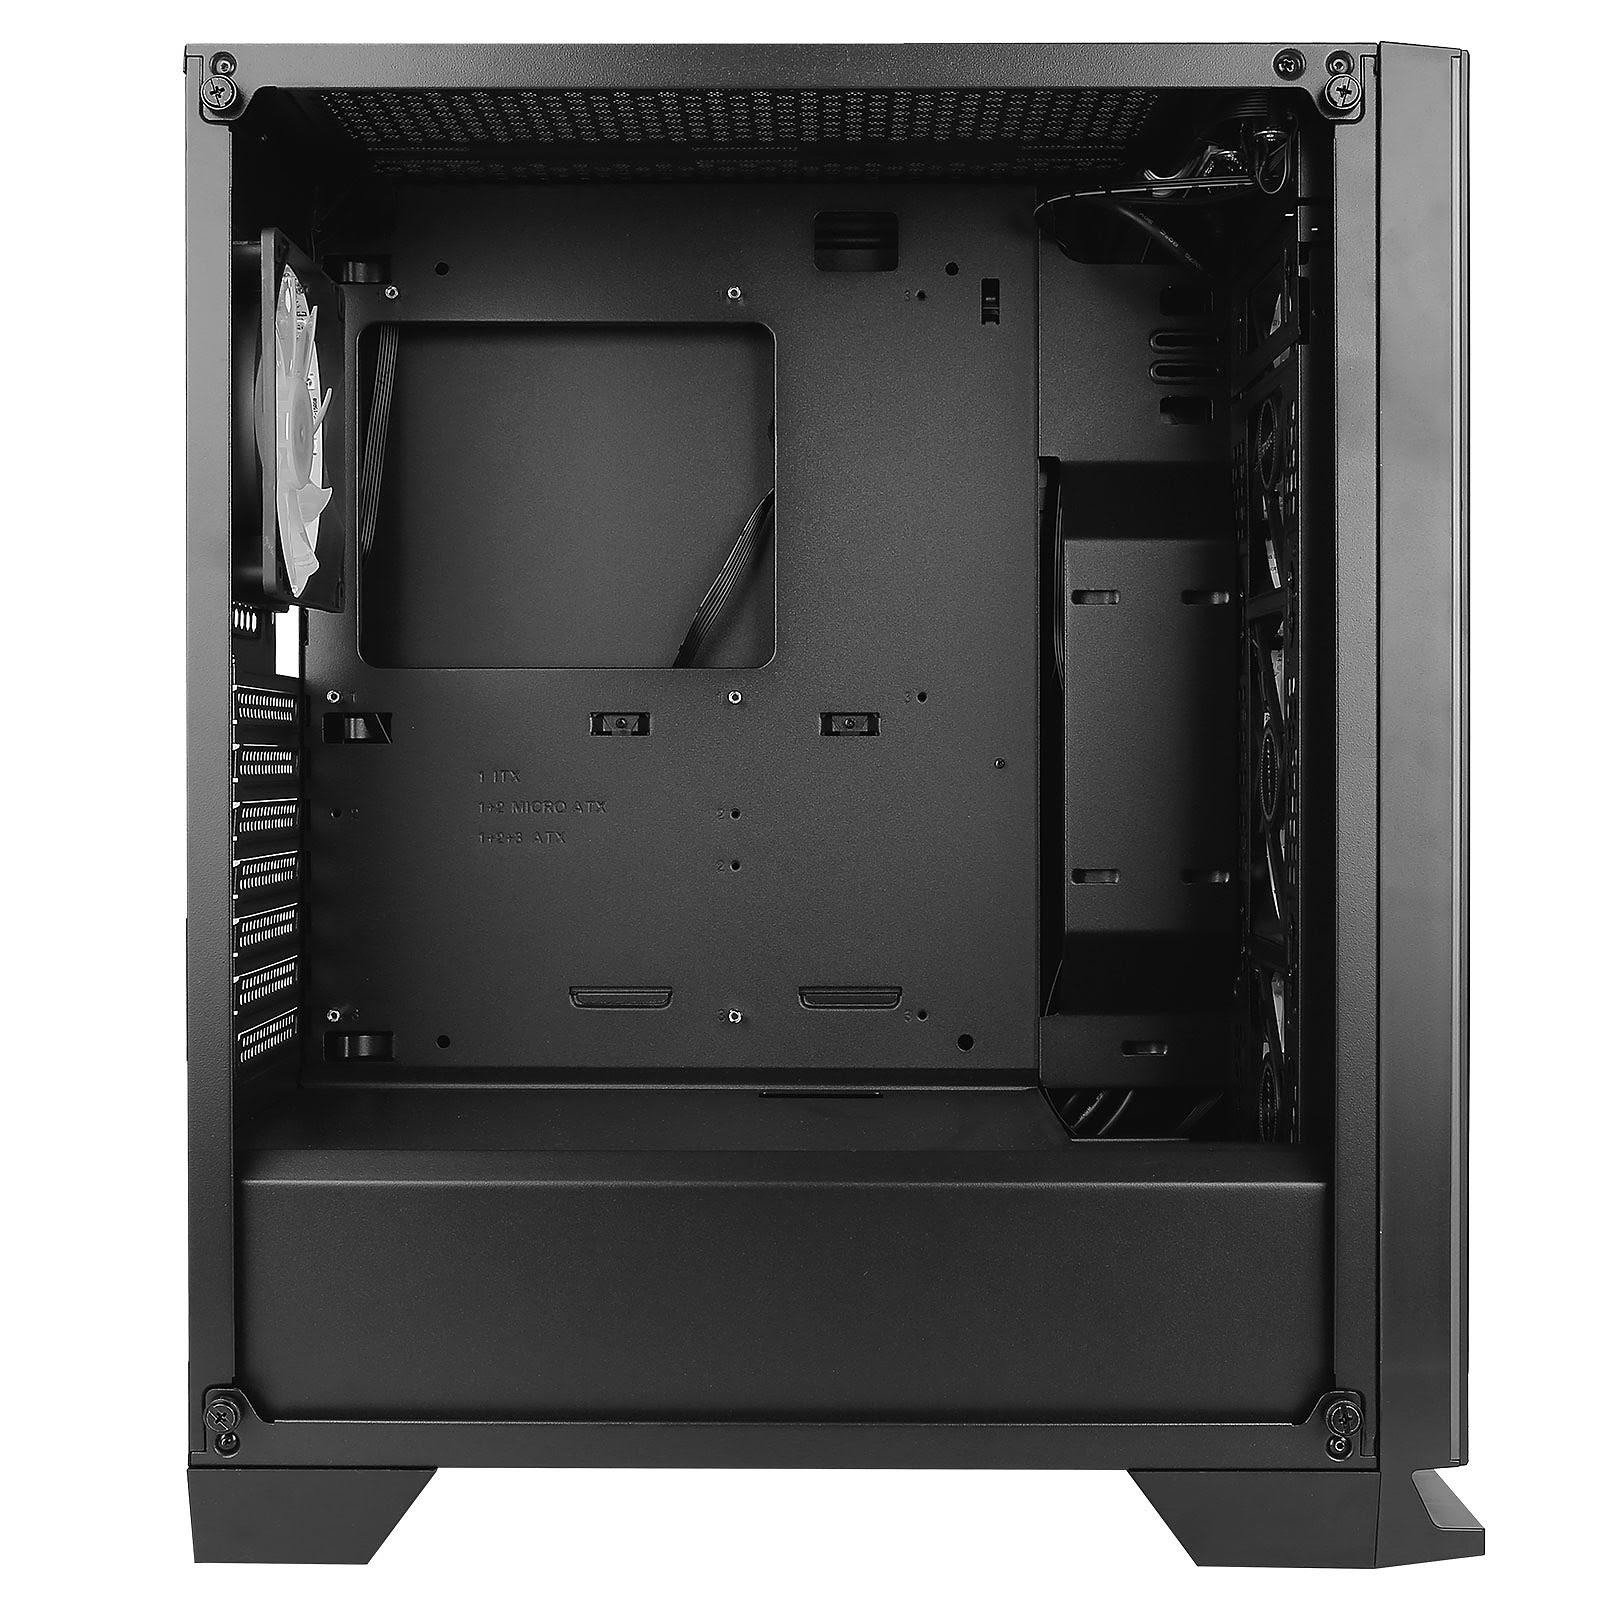 Antec NX600 Noir - Boîtier PC Antec - Cybertek.fr - 3